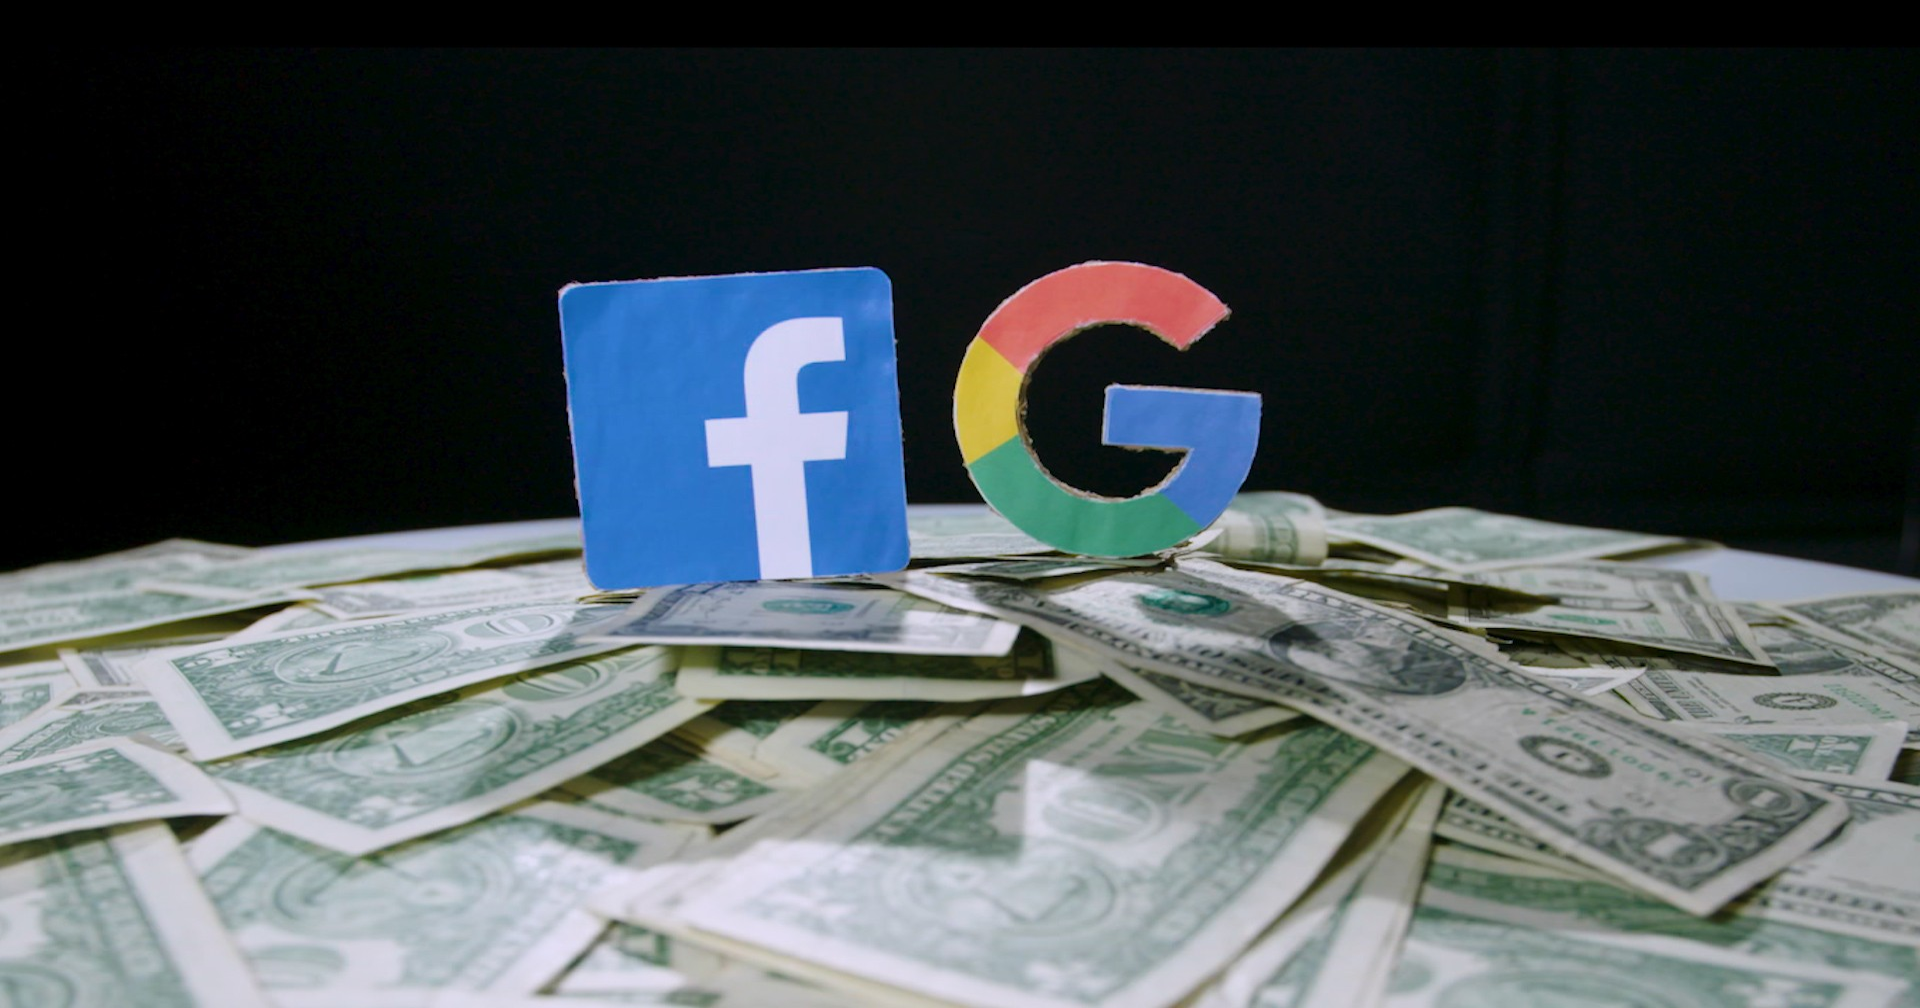 190606154330-google-facebook-duopoly-1.jpg?itok=uMZazWq5